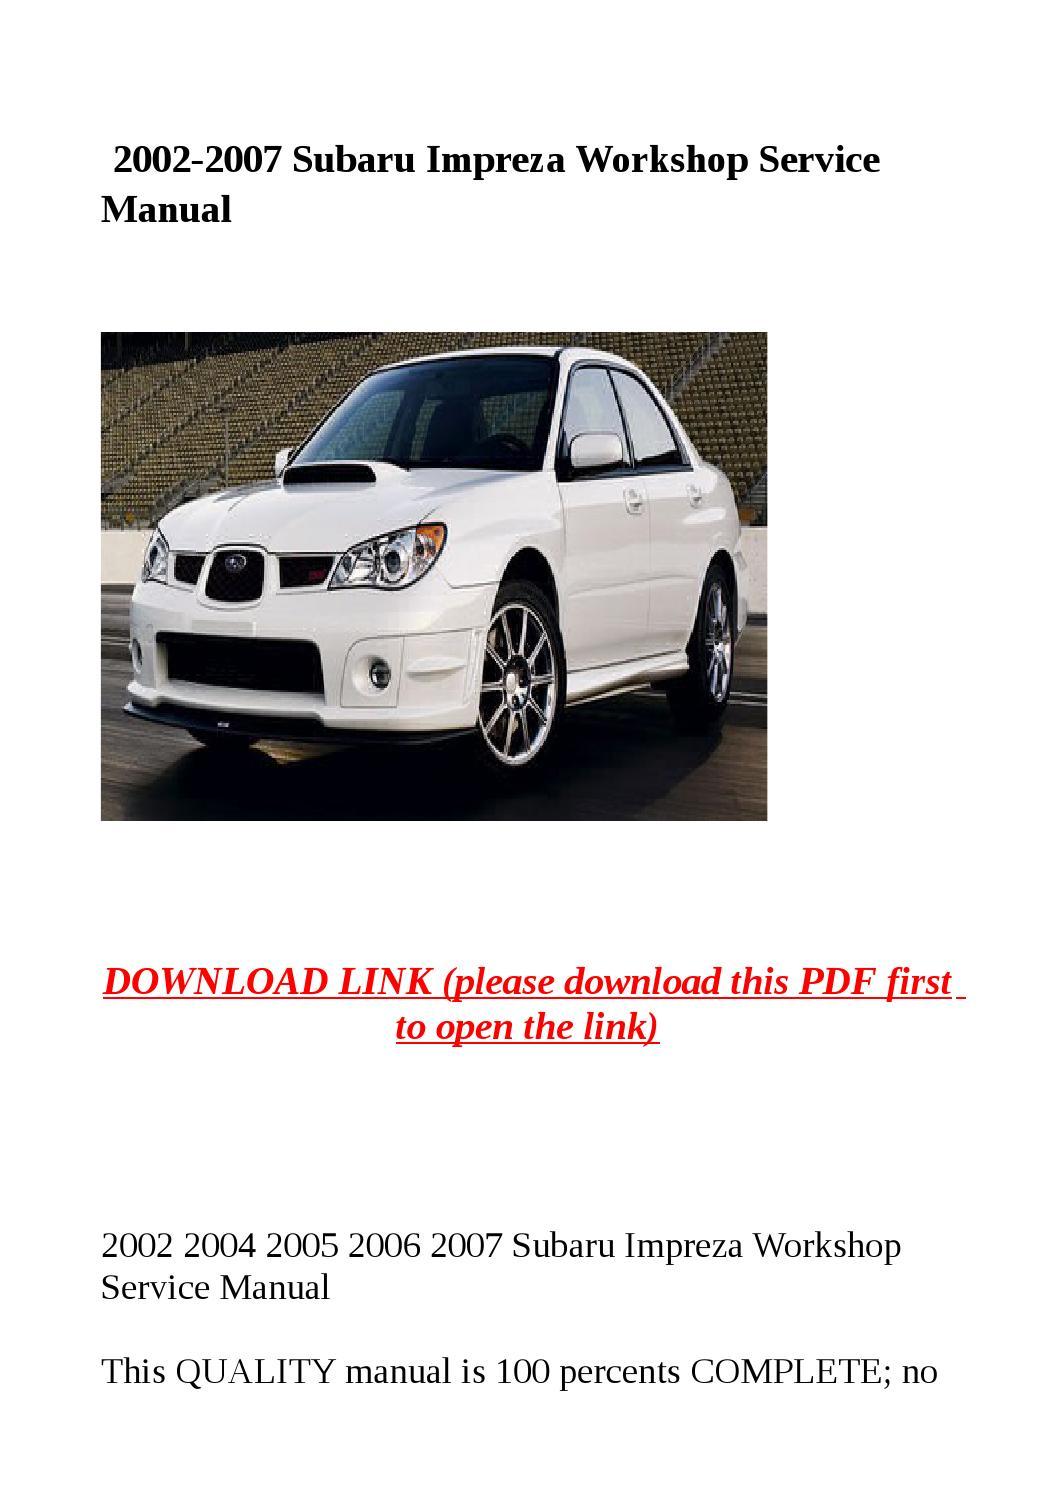 subaru impreza 2007 service manual pdf